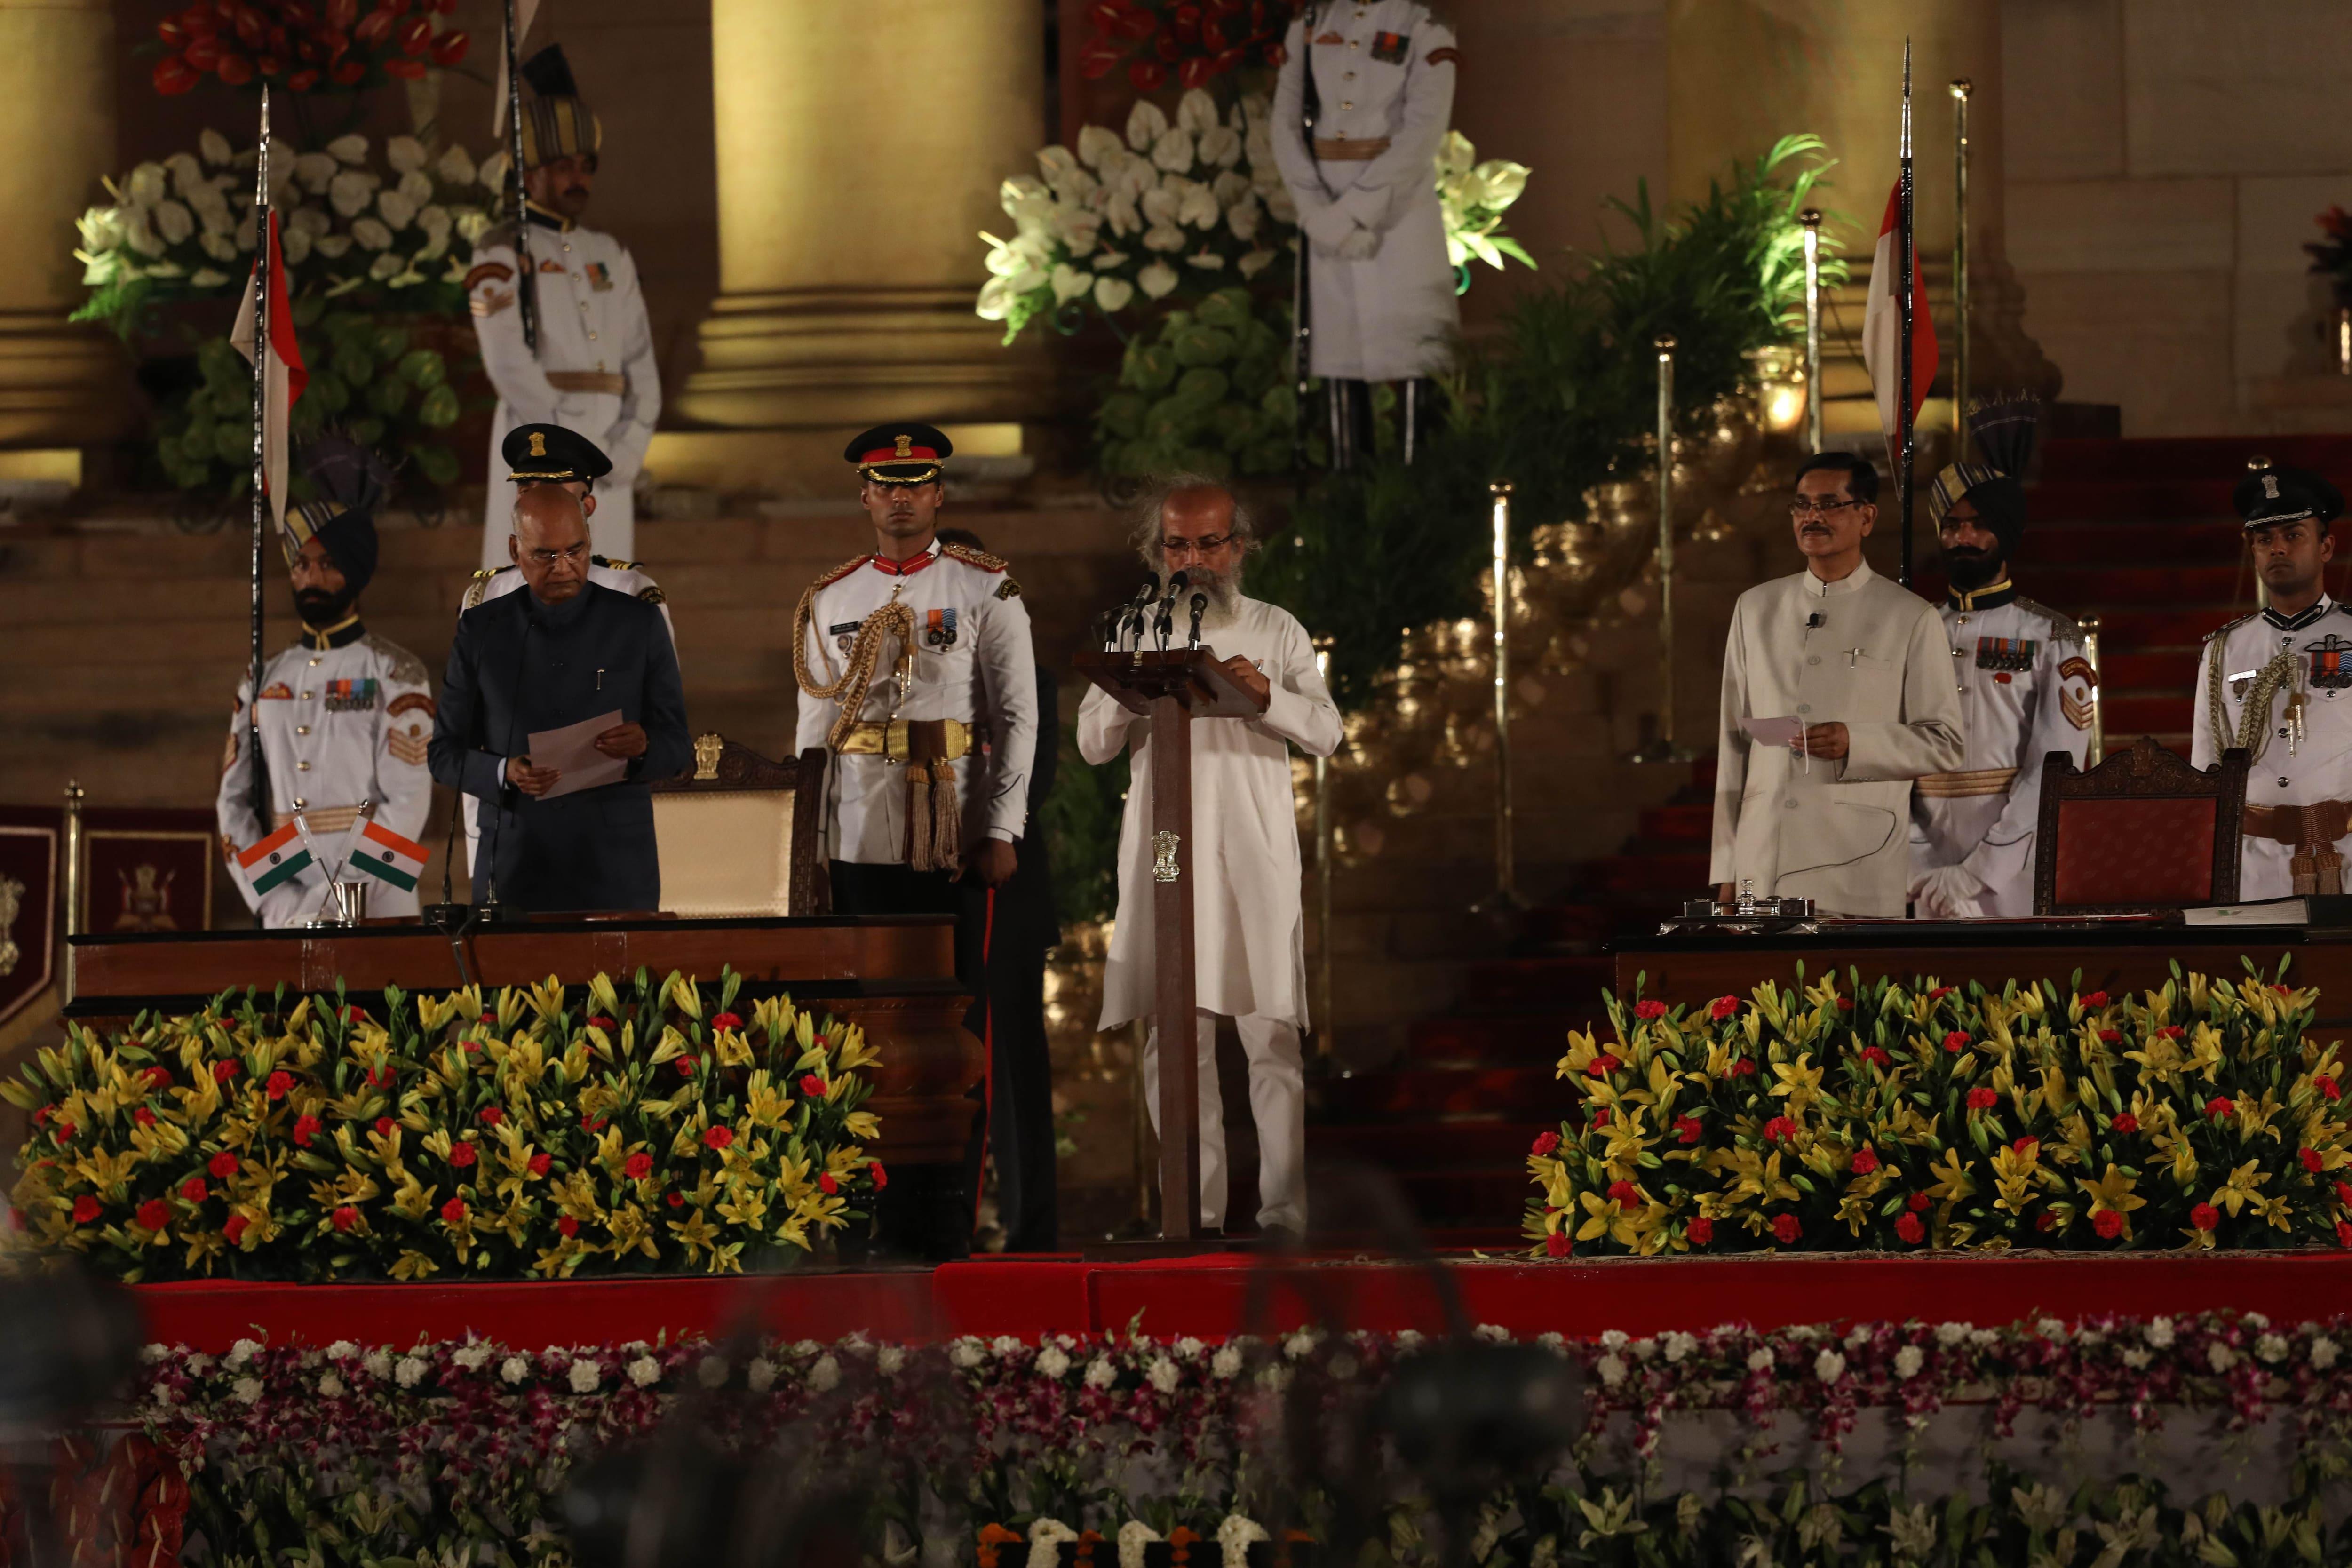 Modi swearing in, Pratap Chandra Sarangi, sarangi oath taking, Narendra Modi government, Minister of State for Odisha, Narendra Modi council of ministers, India news, Indian Express